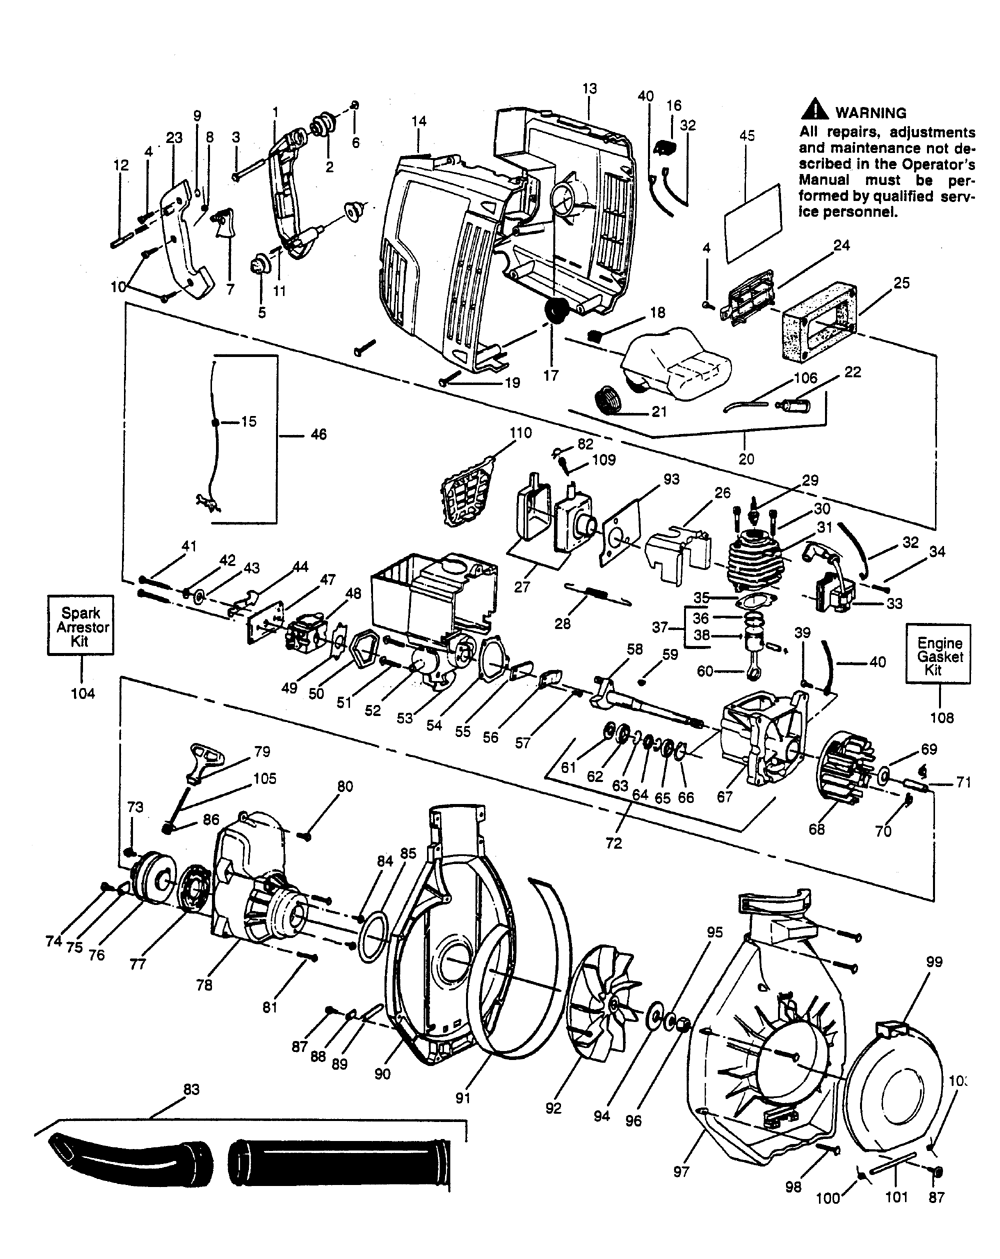 Vacuum Repair: Fein Vacuum Repair Parts